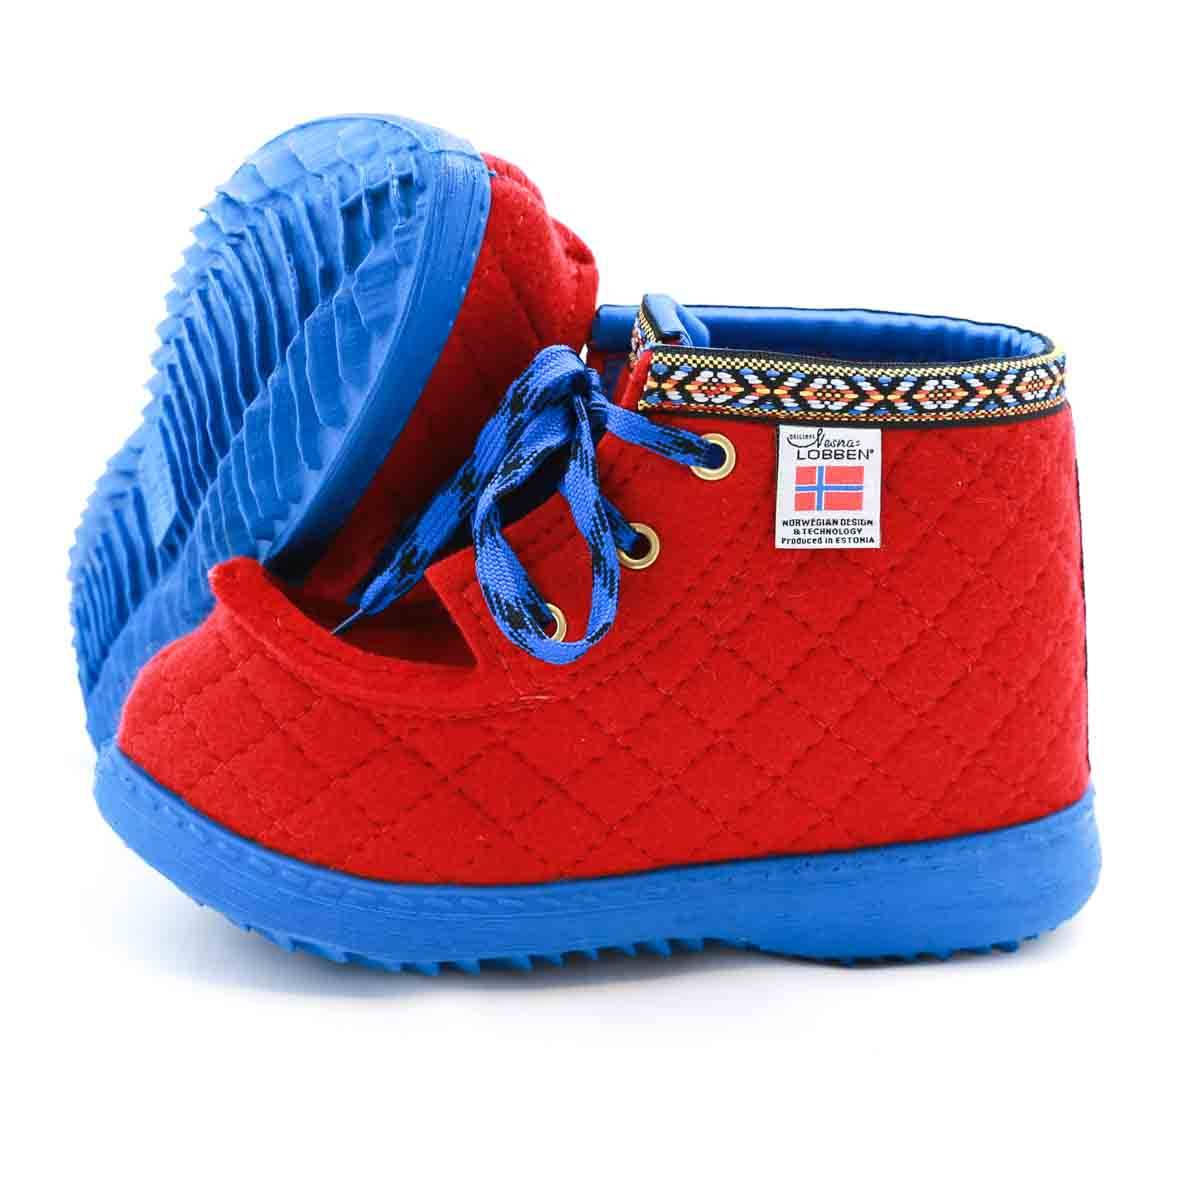 Nesna shoes original red adult